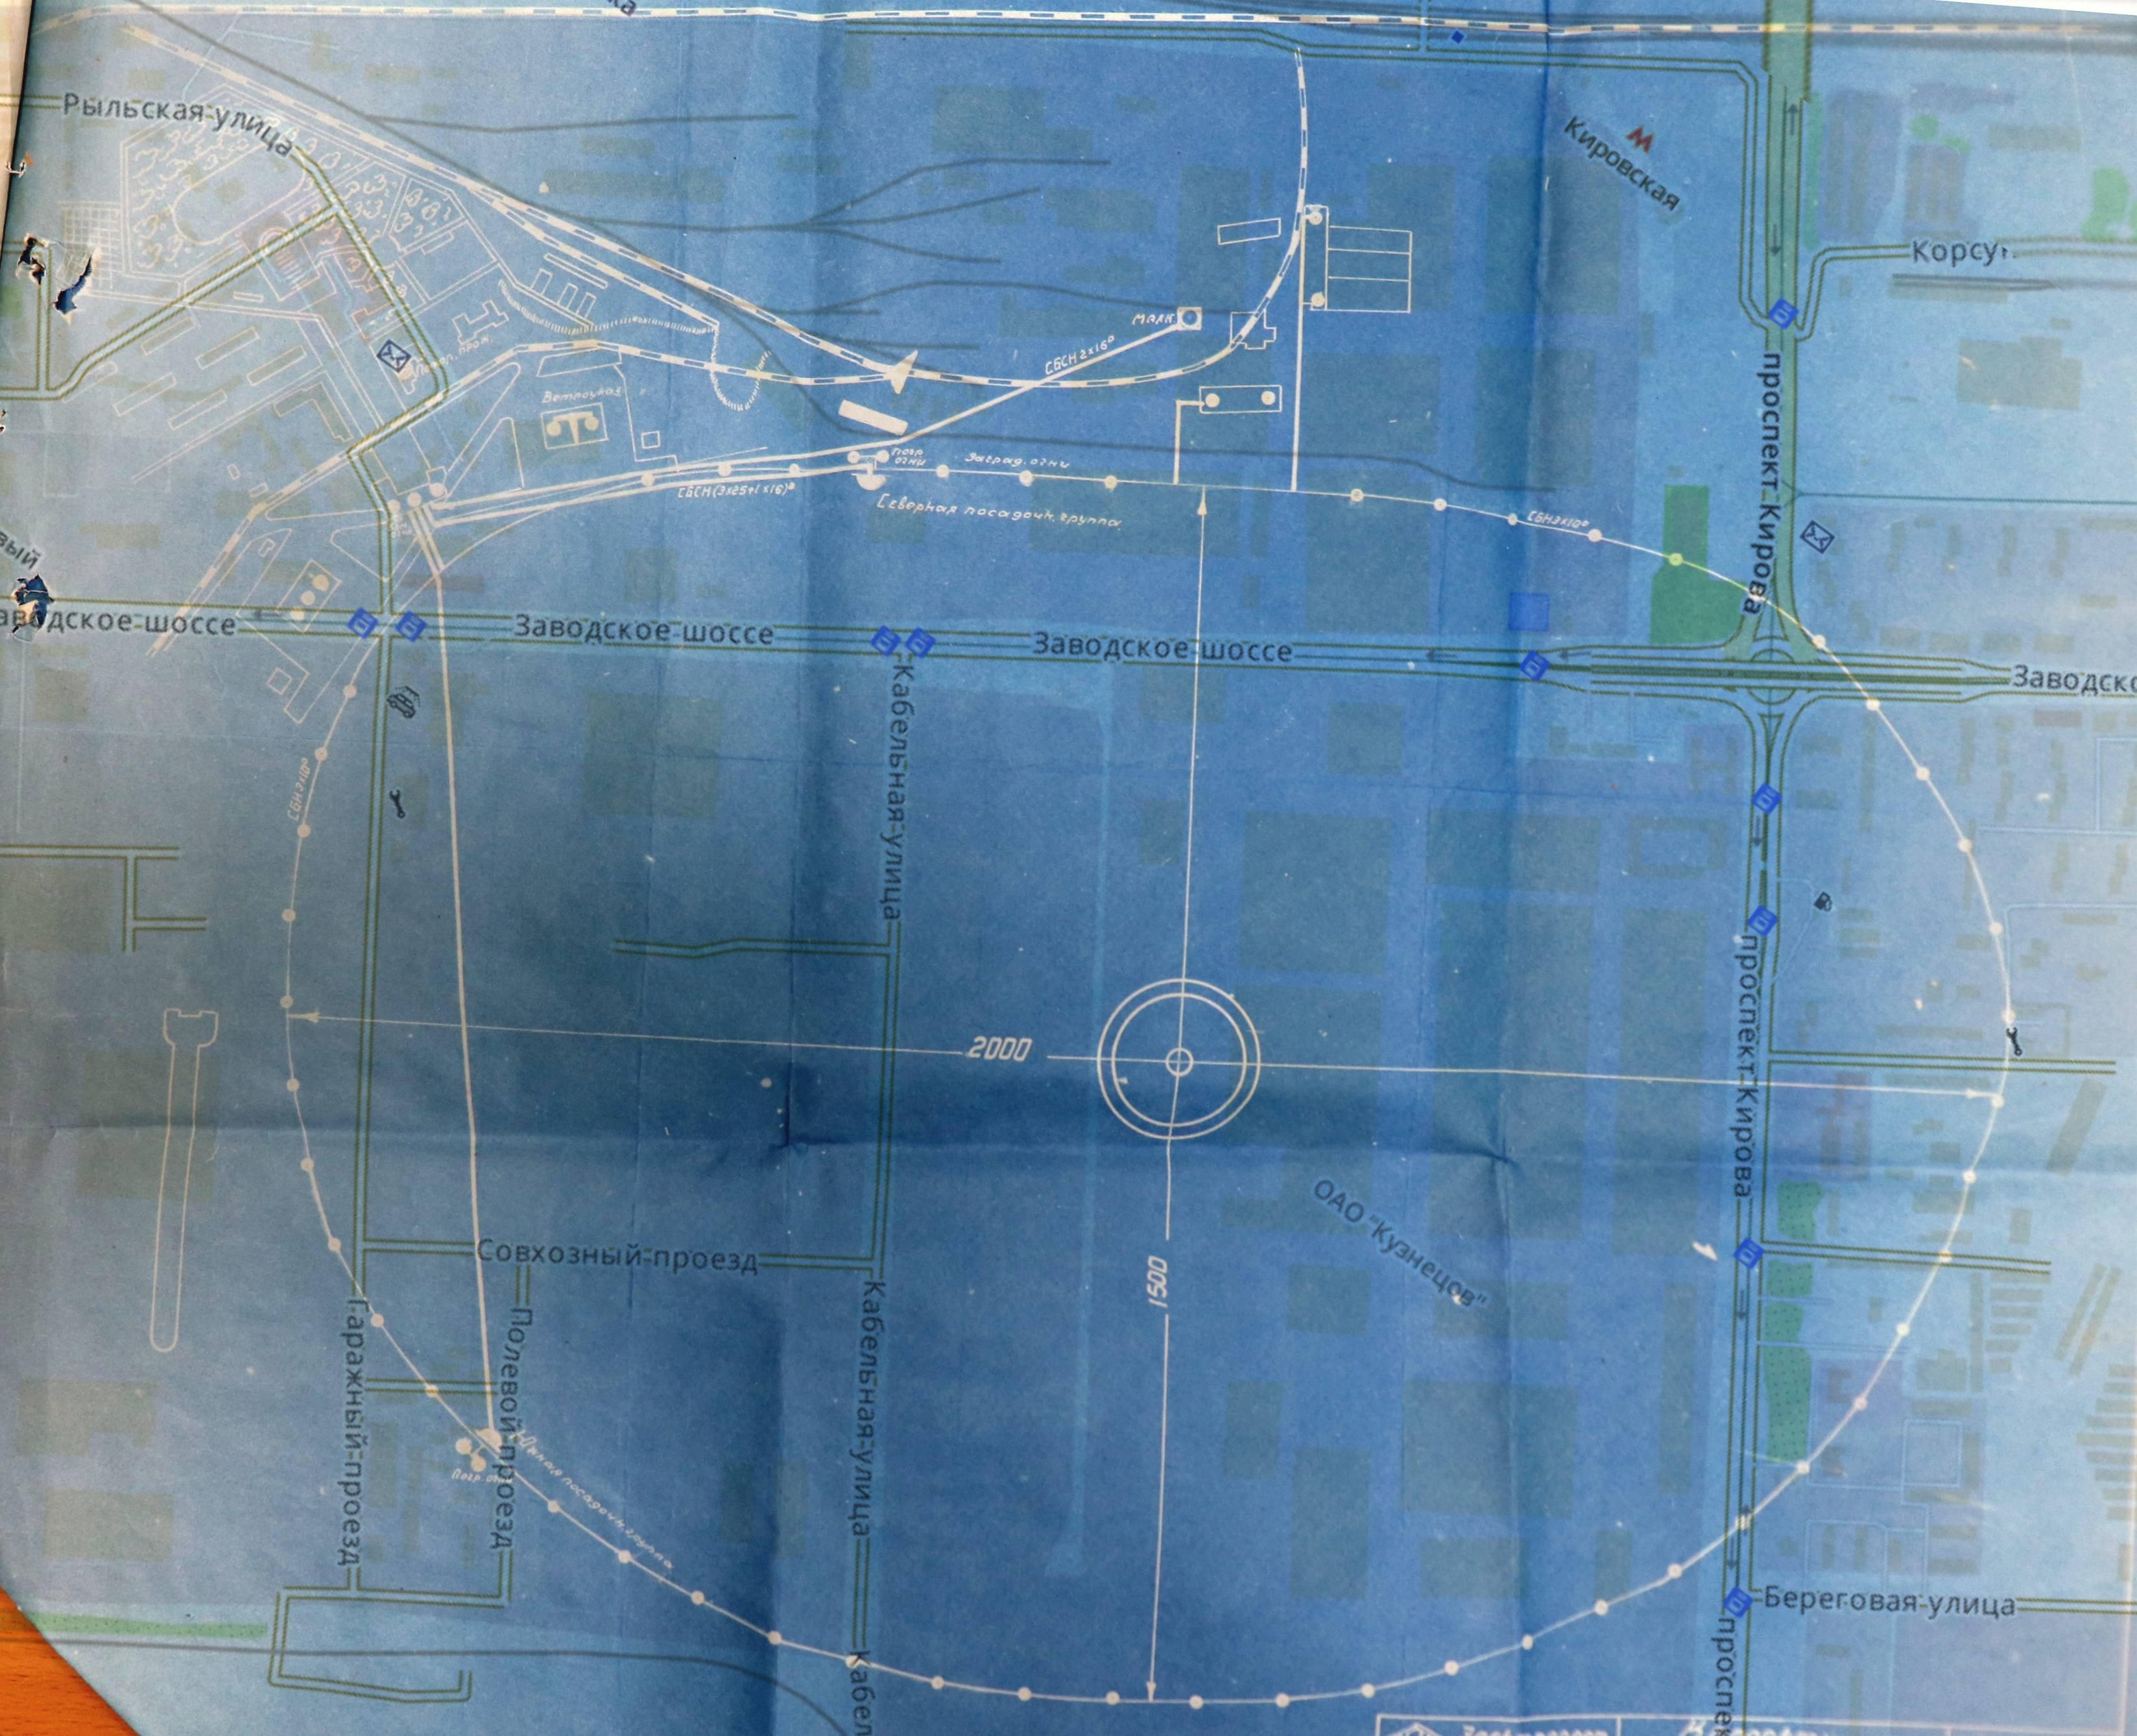 05 Аэродром и авиагородок. Схема 1931 года